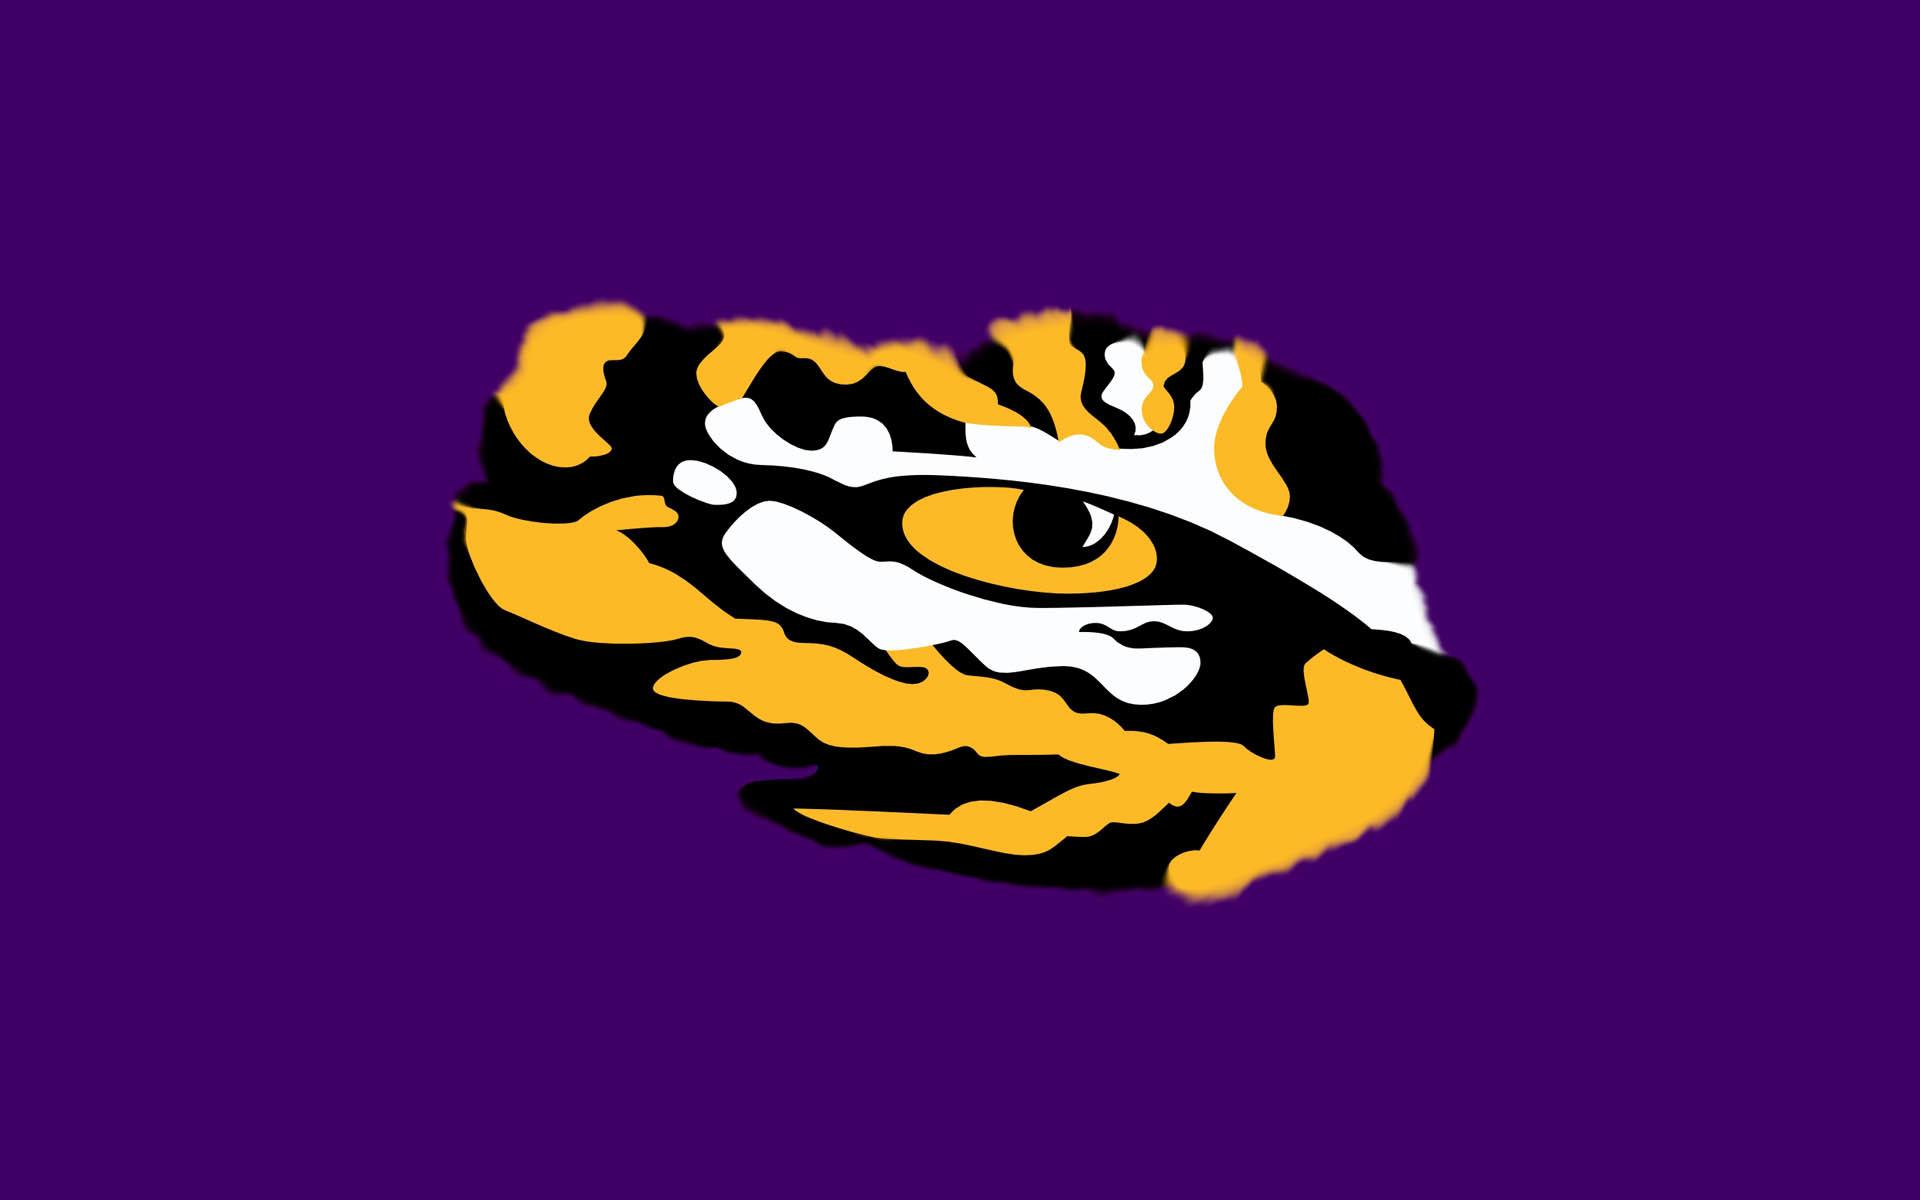 LSU Tiger Eye Sports Team Logo Wallpaper for ipad | cute Wallpapers